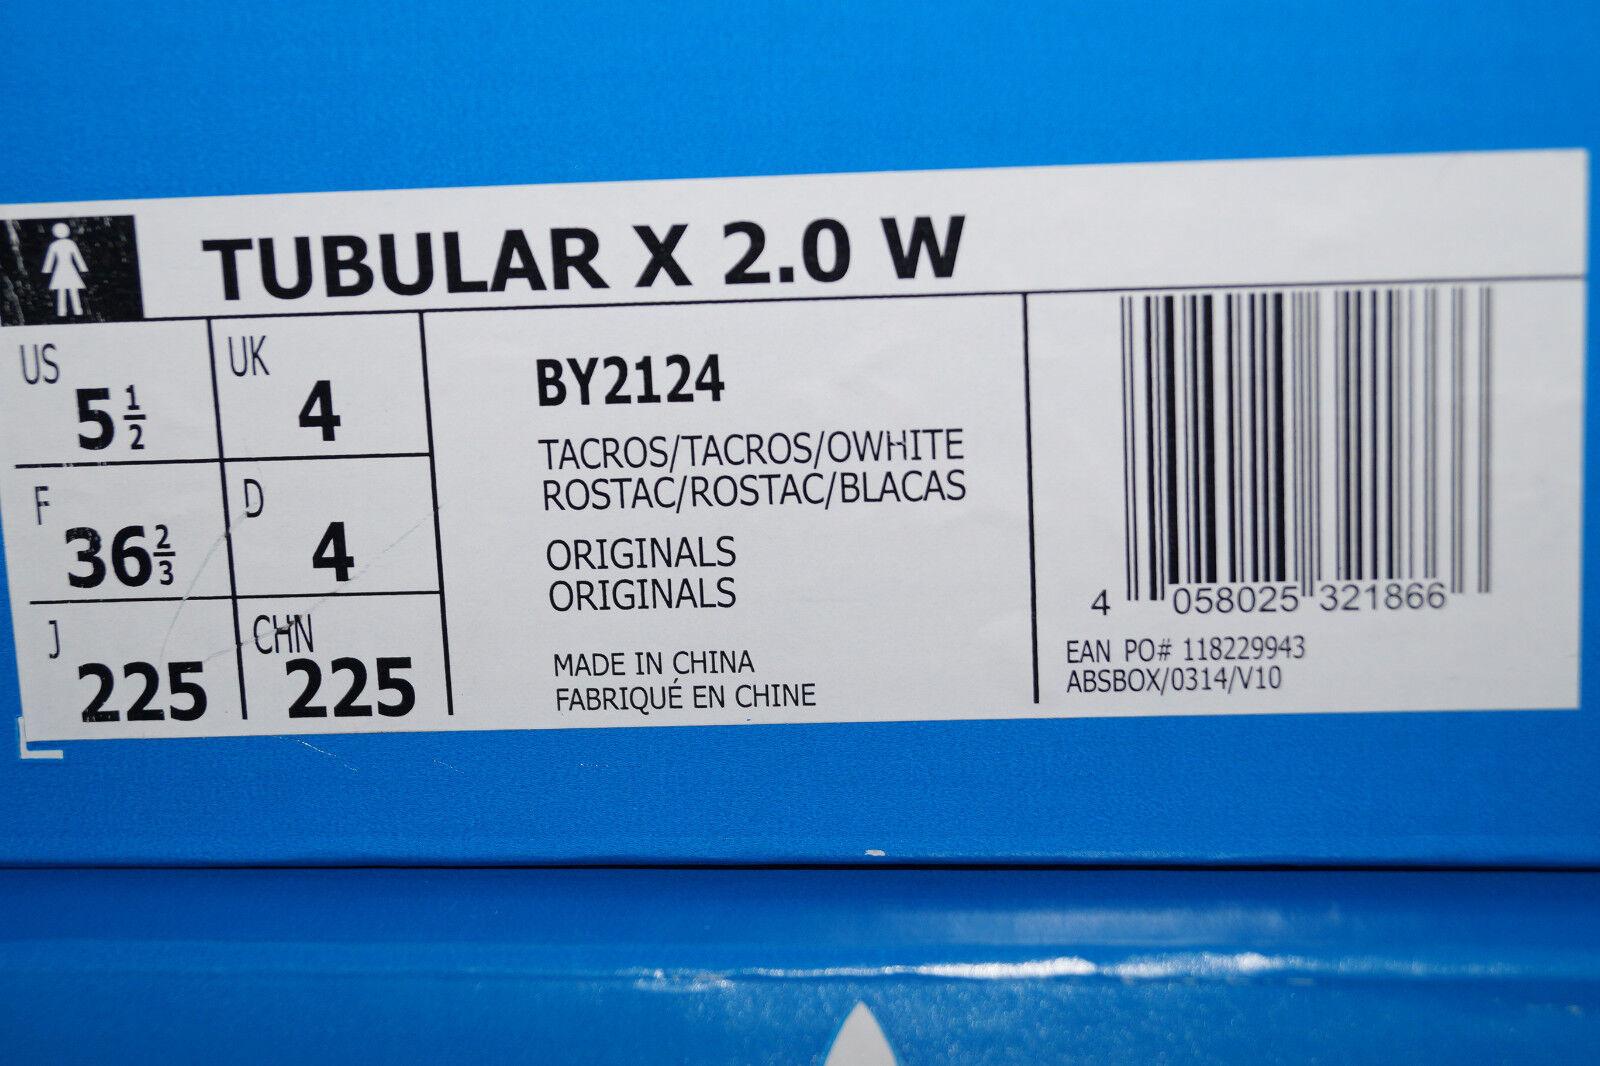 Descuento Adidas Originals Originals Originals tubular x 2.0 PK primeknit W UE 37.3 UK 4.5 rosa blanco roto by2124 fa81dc